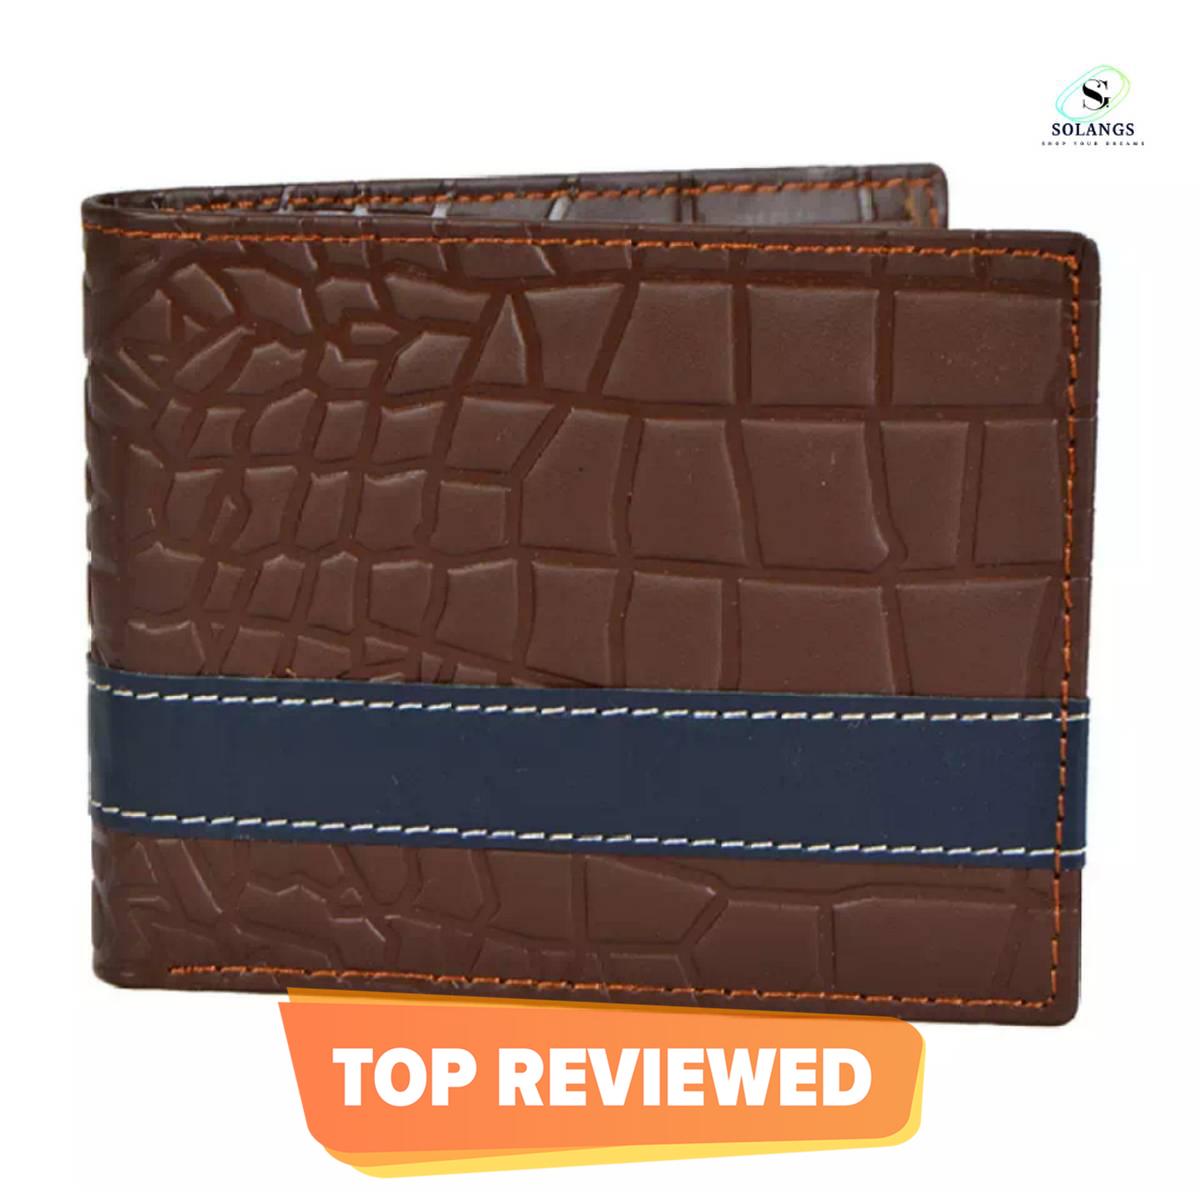 Genuine Leather Crocodile Design Trifold Card Holder Wallet for Men - Brown